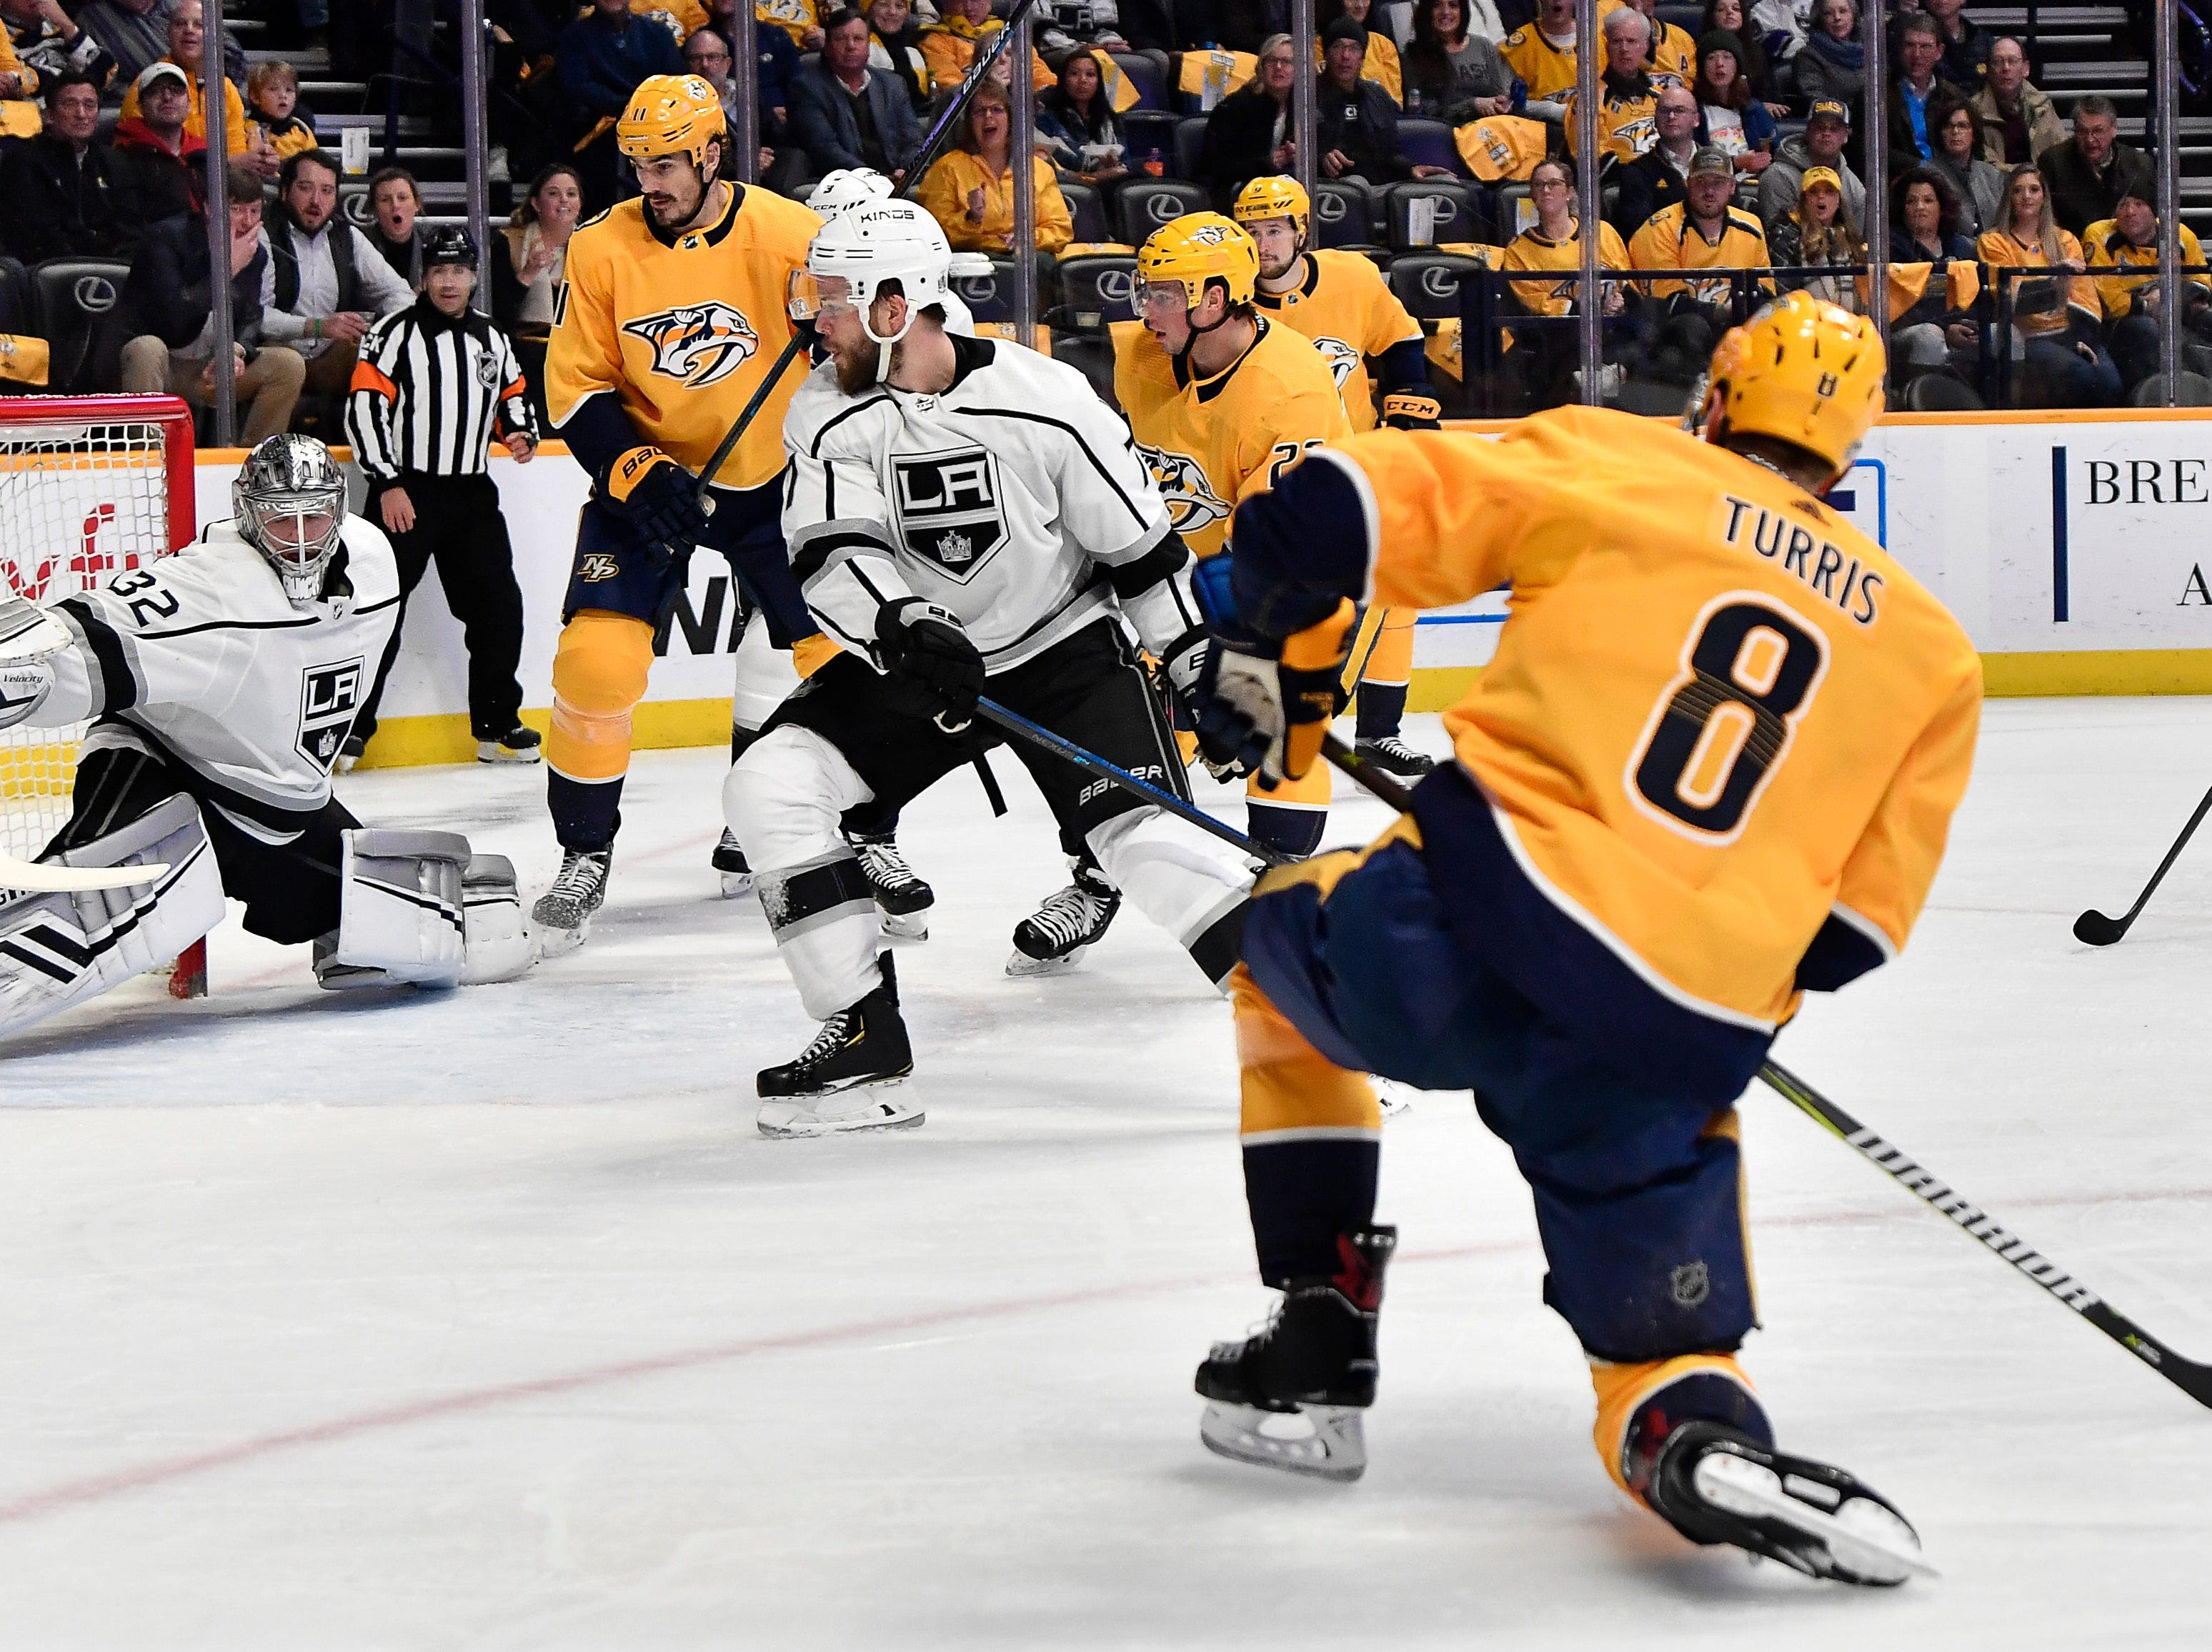 Predators center Kyle Turris (8) scores a goal past Kings goaltender Jonathan Quick (32) during the first period at Bridgestone Arena Thursday, Feb. 21, 2019 in Nashville, Tenn.